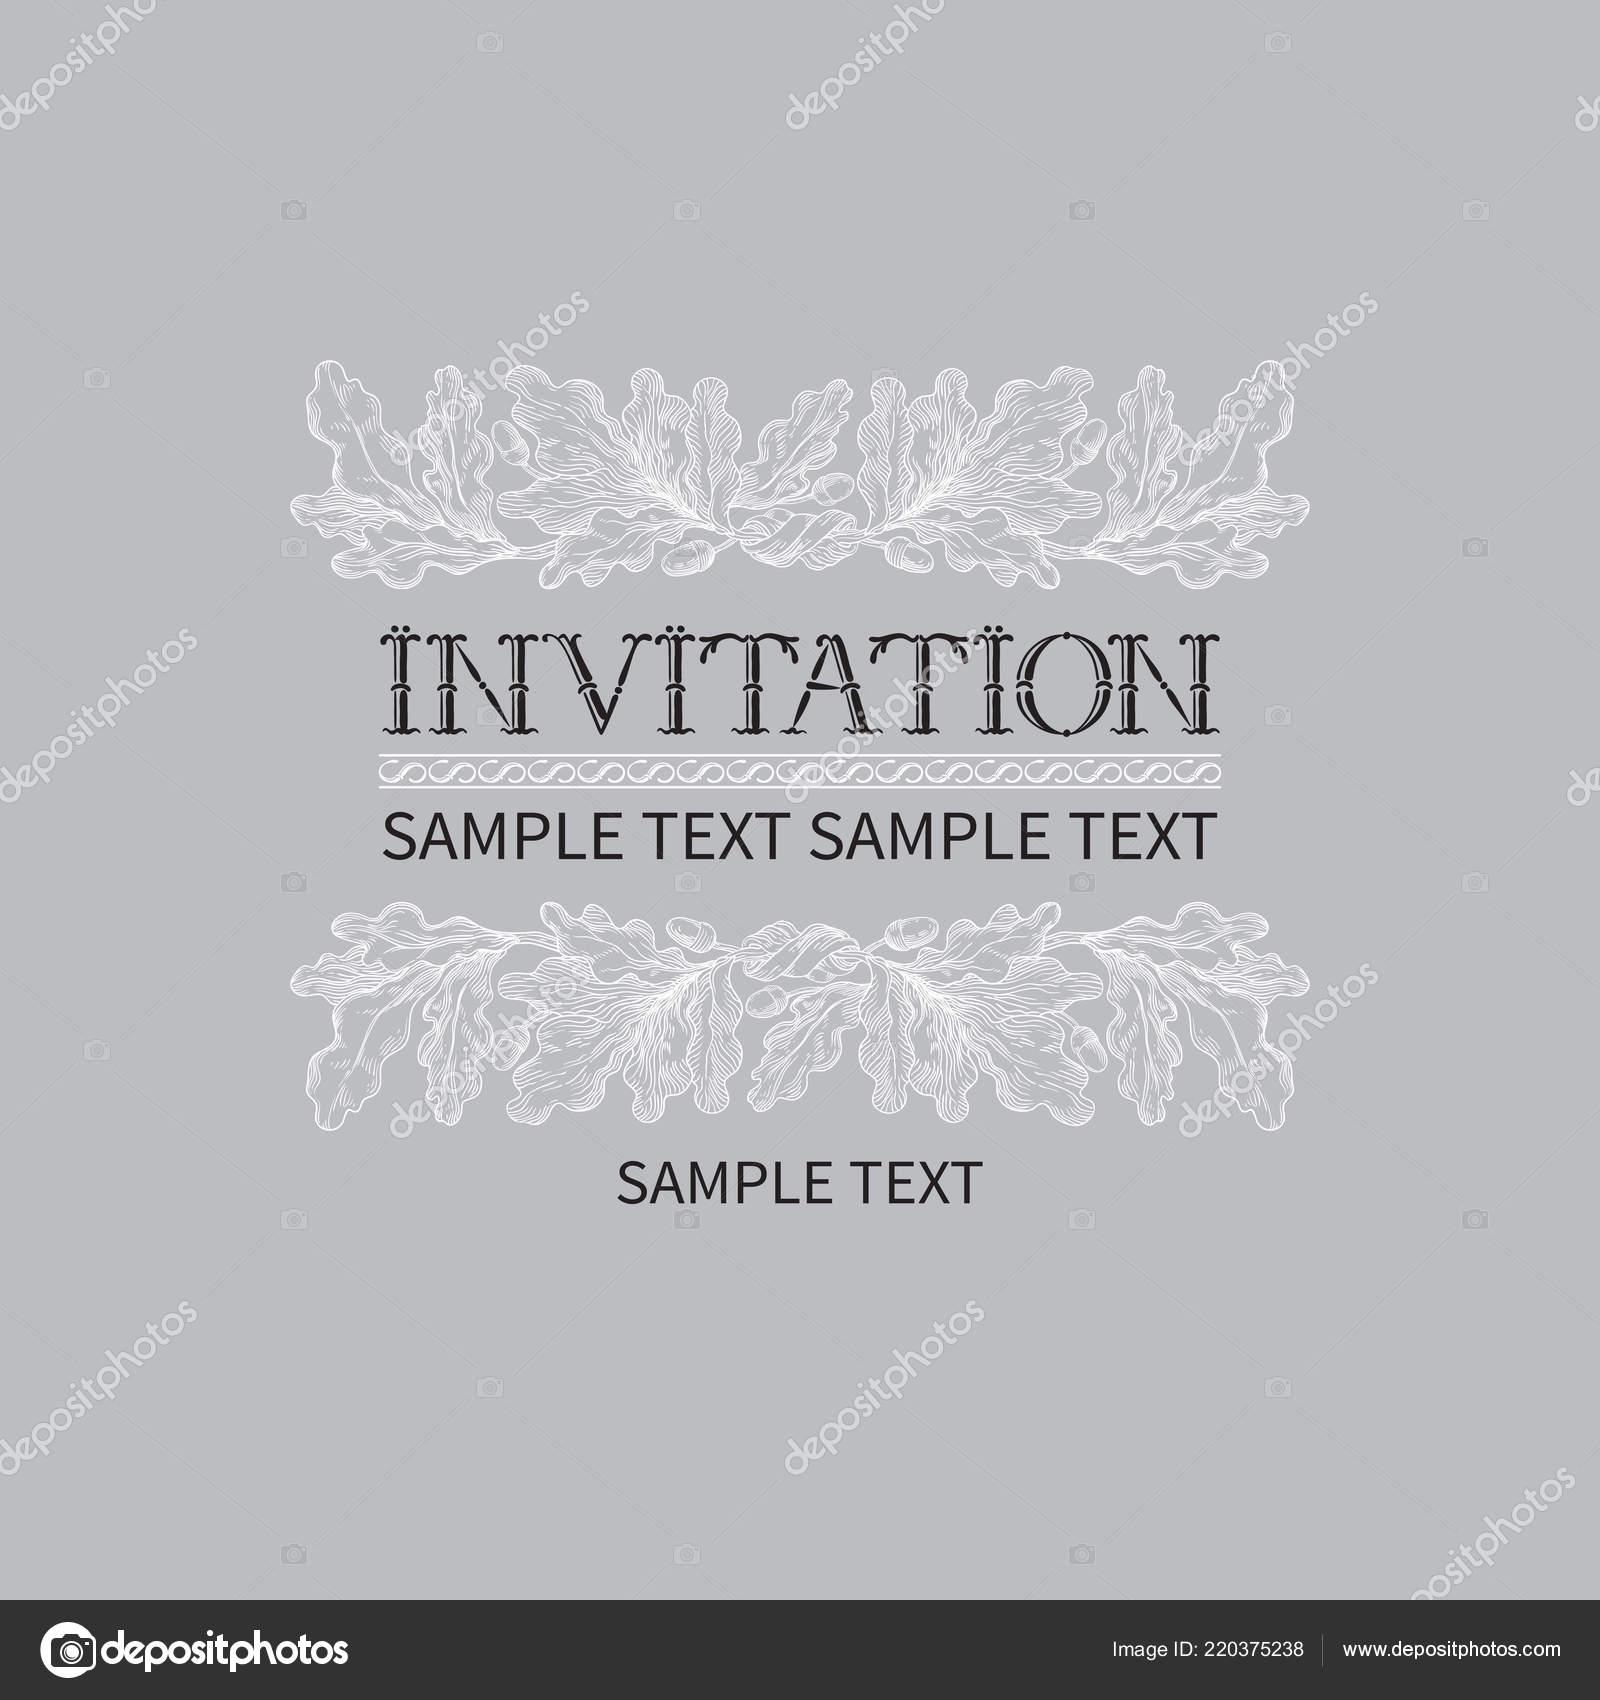 Vintage Invitation Card Vector Background Lettering Hand